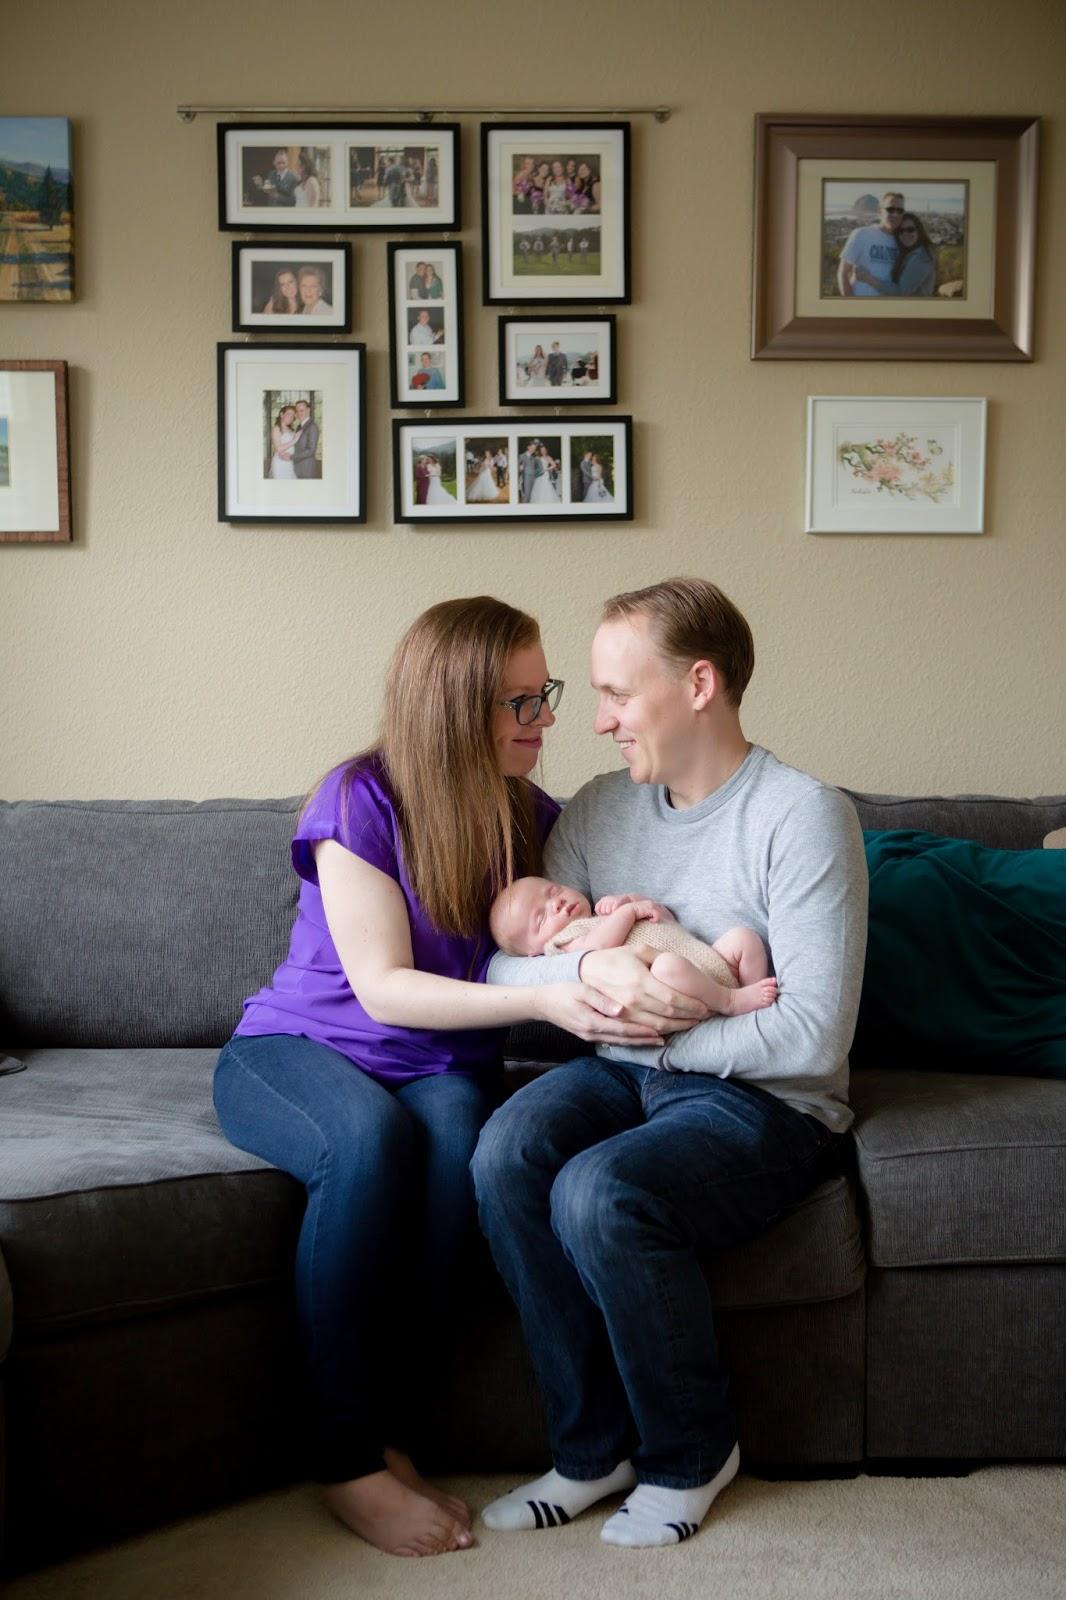 new family beneath wedding photos